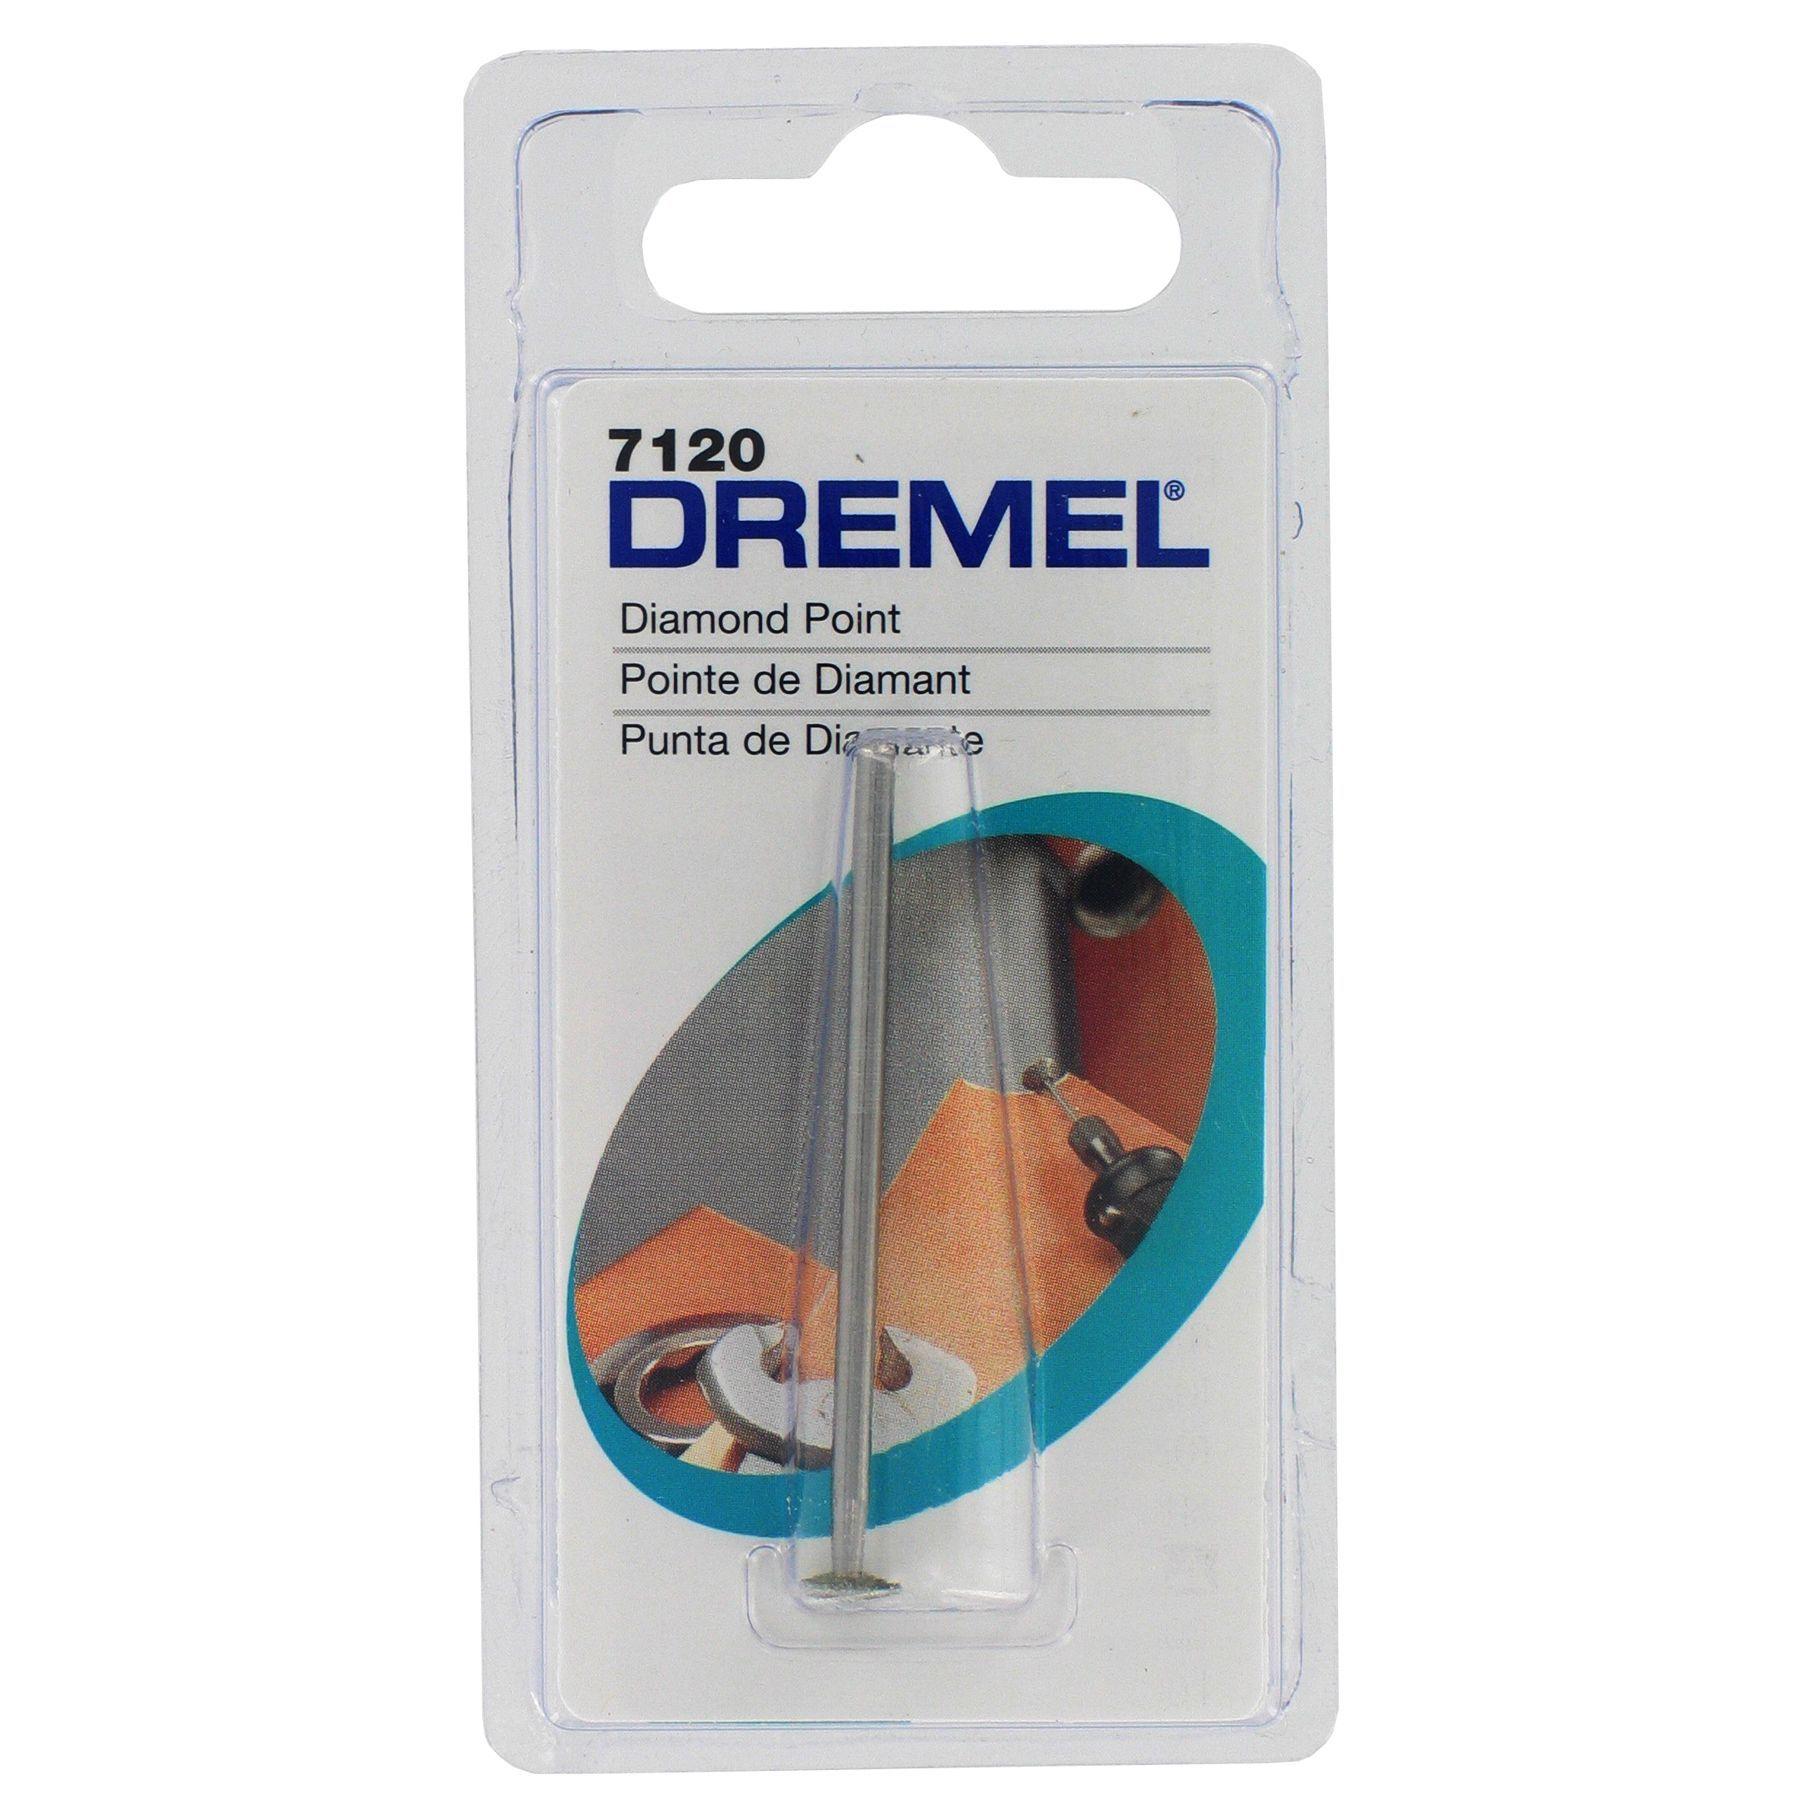 Online Shopping Bedding Furniture Electronics Jewelry Clothing More Dremel Diamond Wheel Dremel Power Tool Accessories